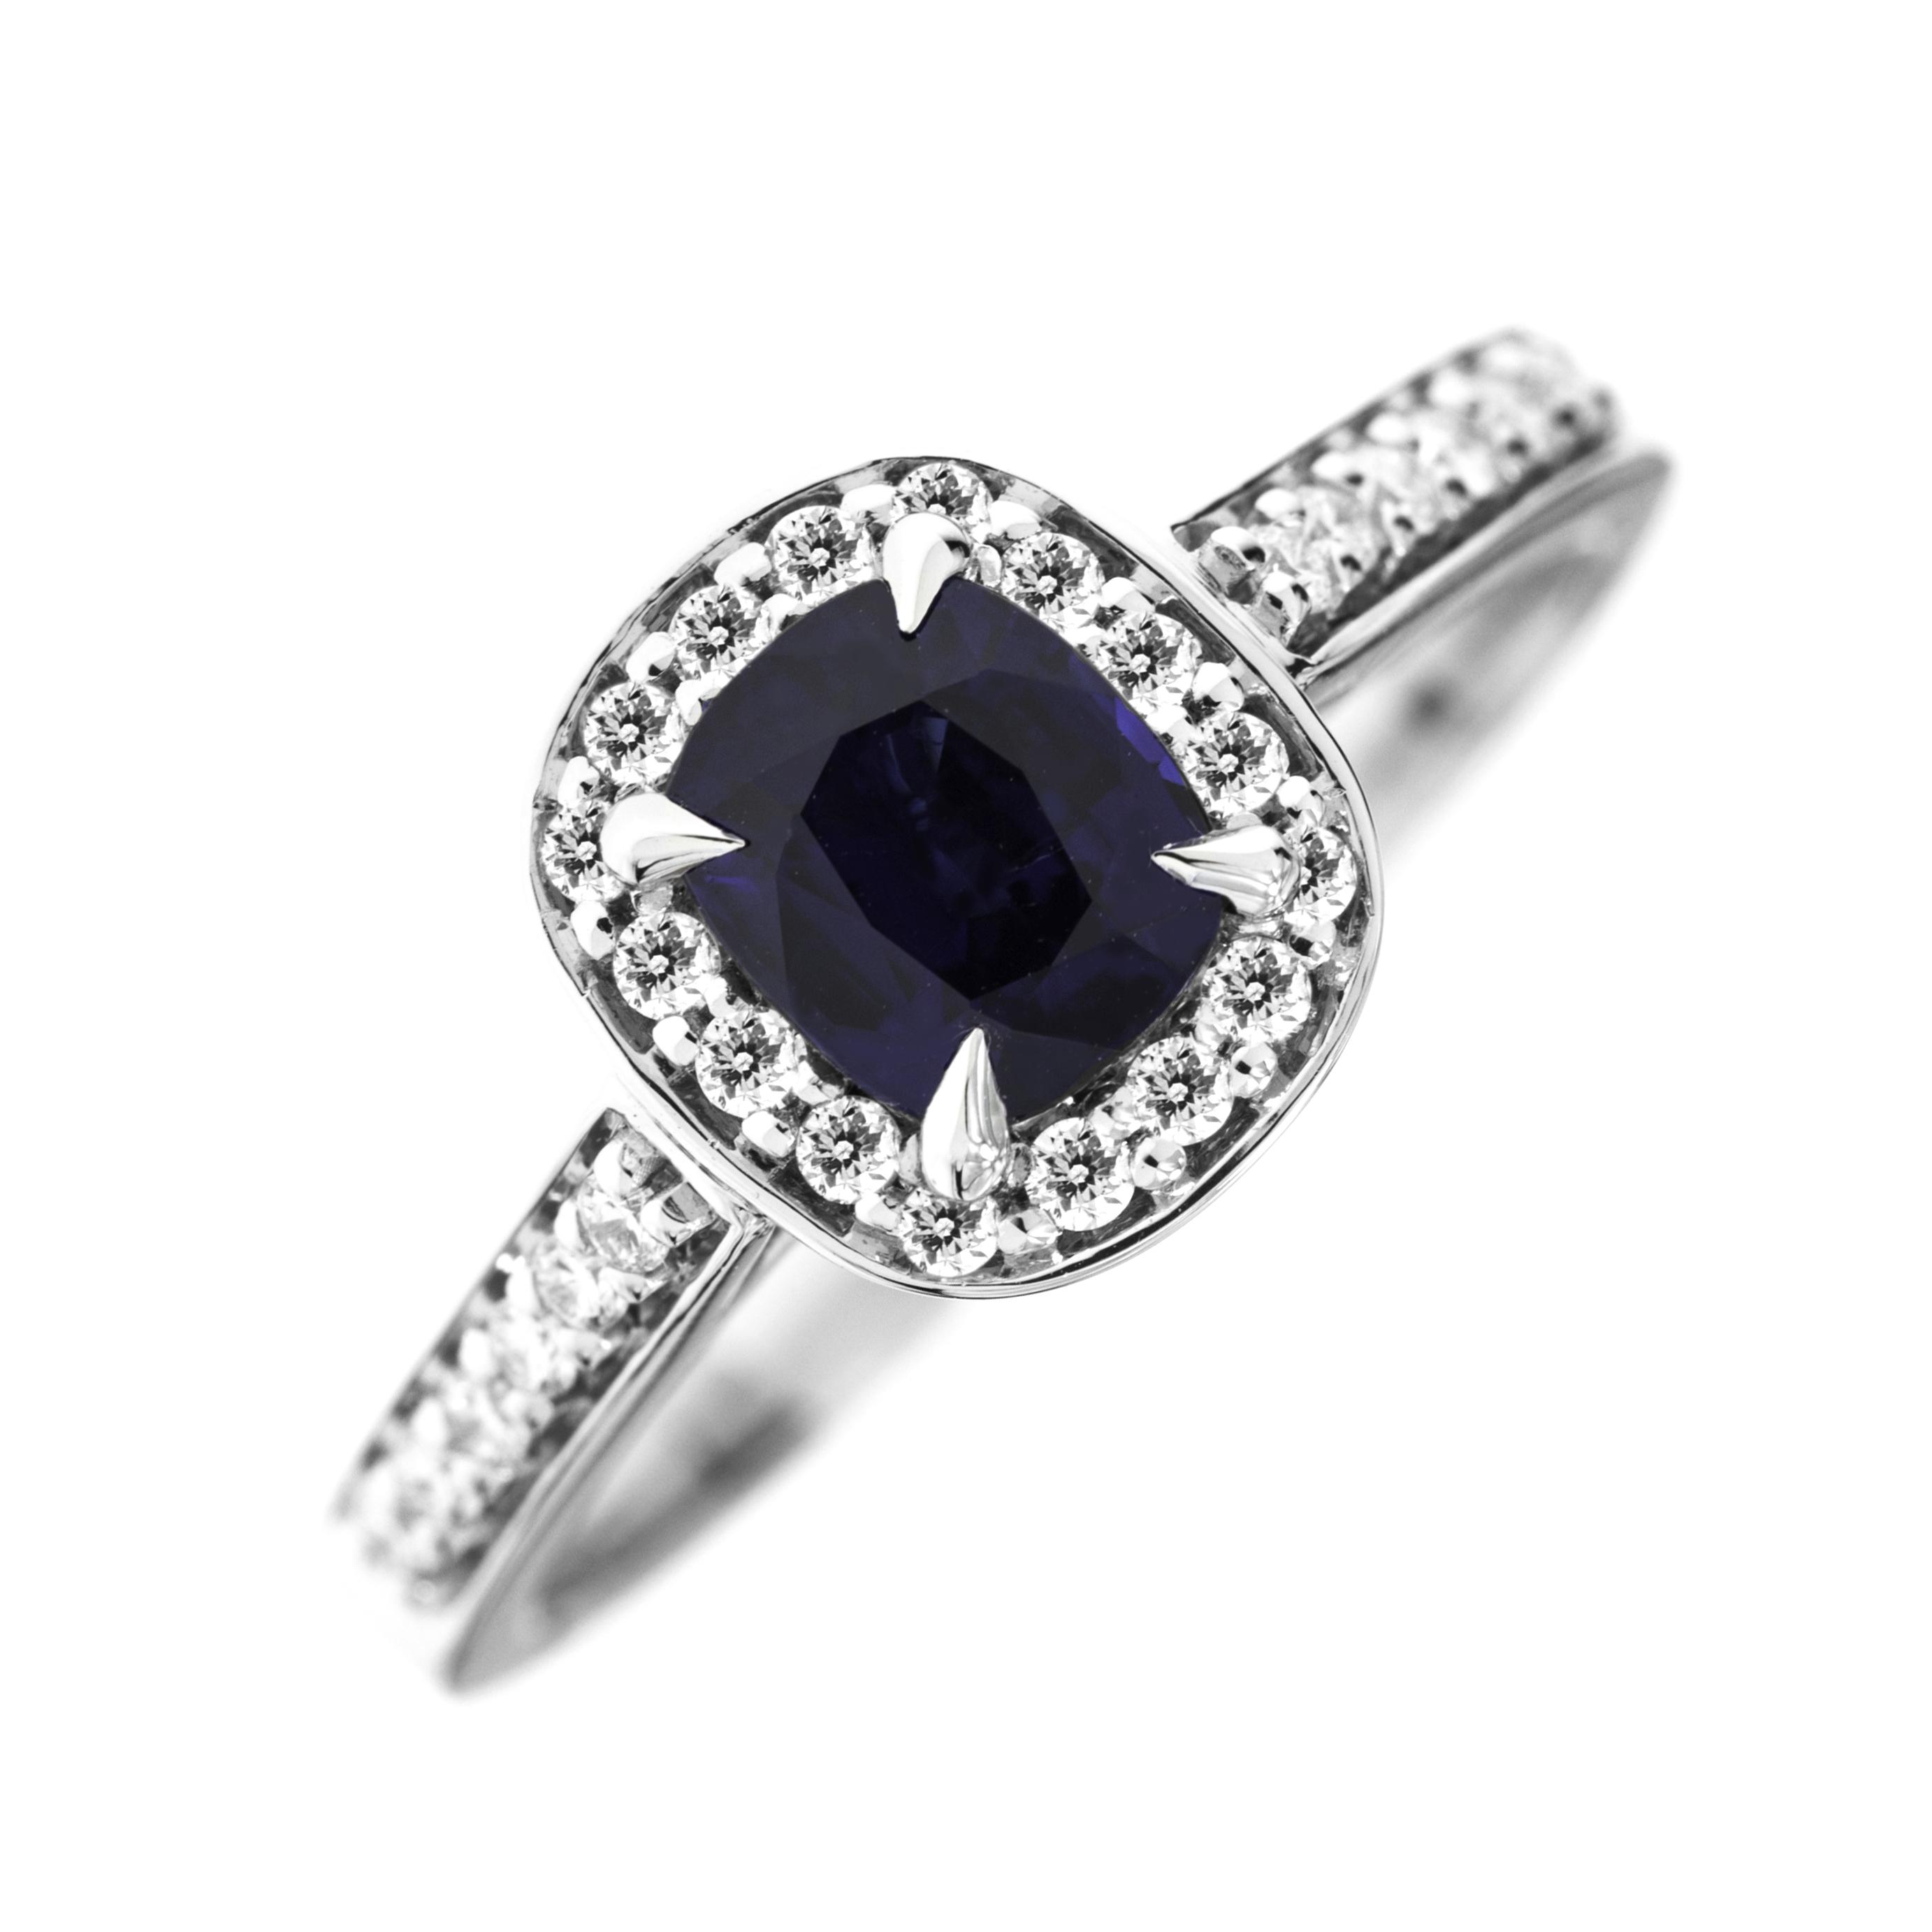 RDS743W-Inel cu Safir si Diamant Dama Aur Alb 18kt cu un Safir Cushion Cut si Diamante Rotund Briliant Imprejur si pe Margini-img1